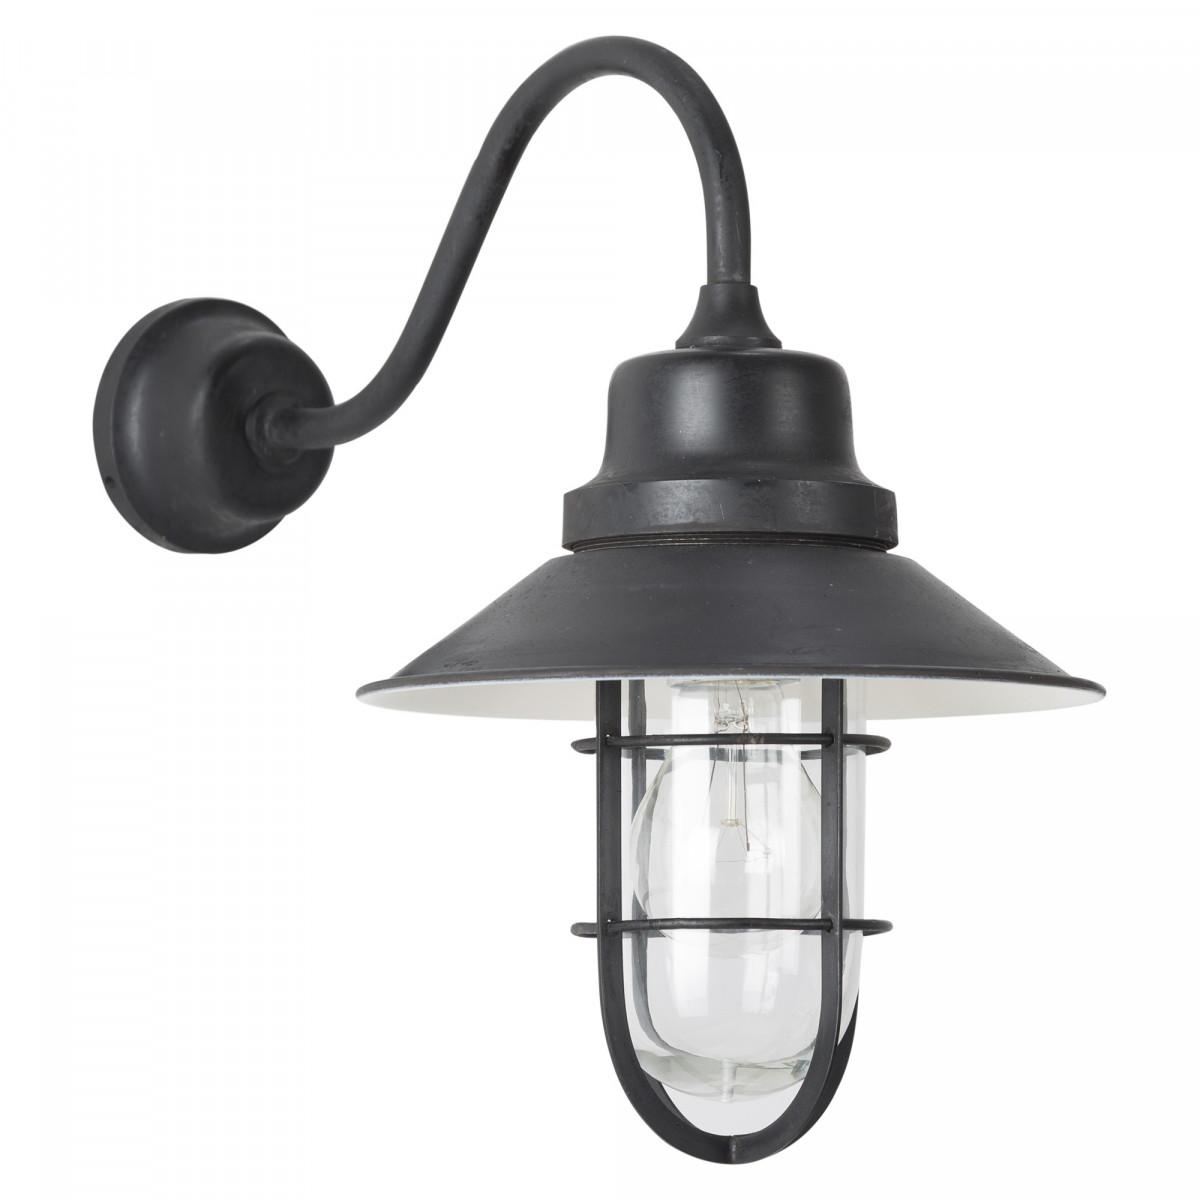 Vermont Wandlampe Antik-Schwarz